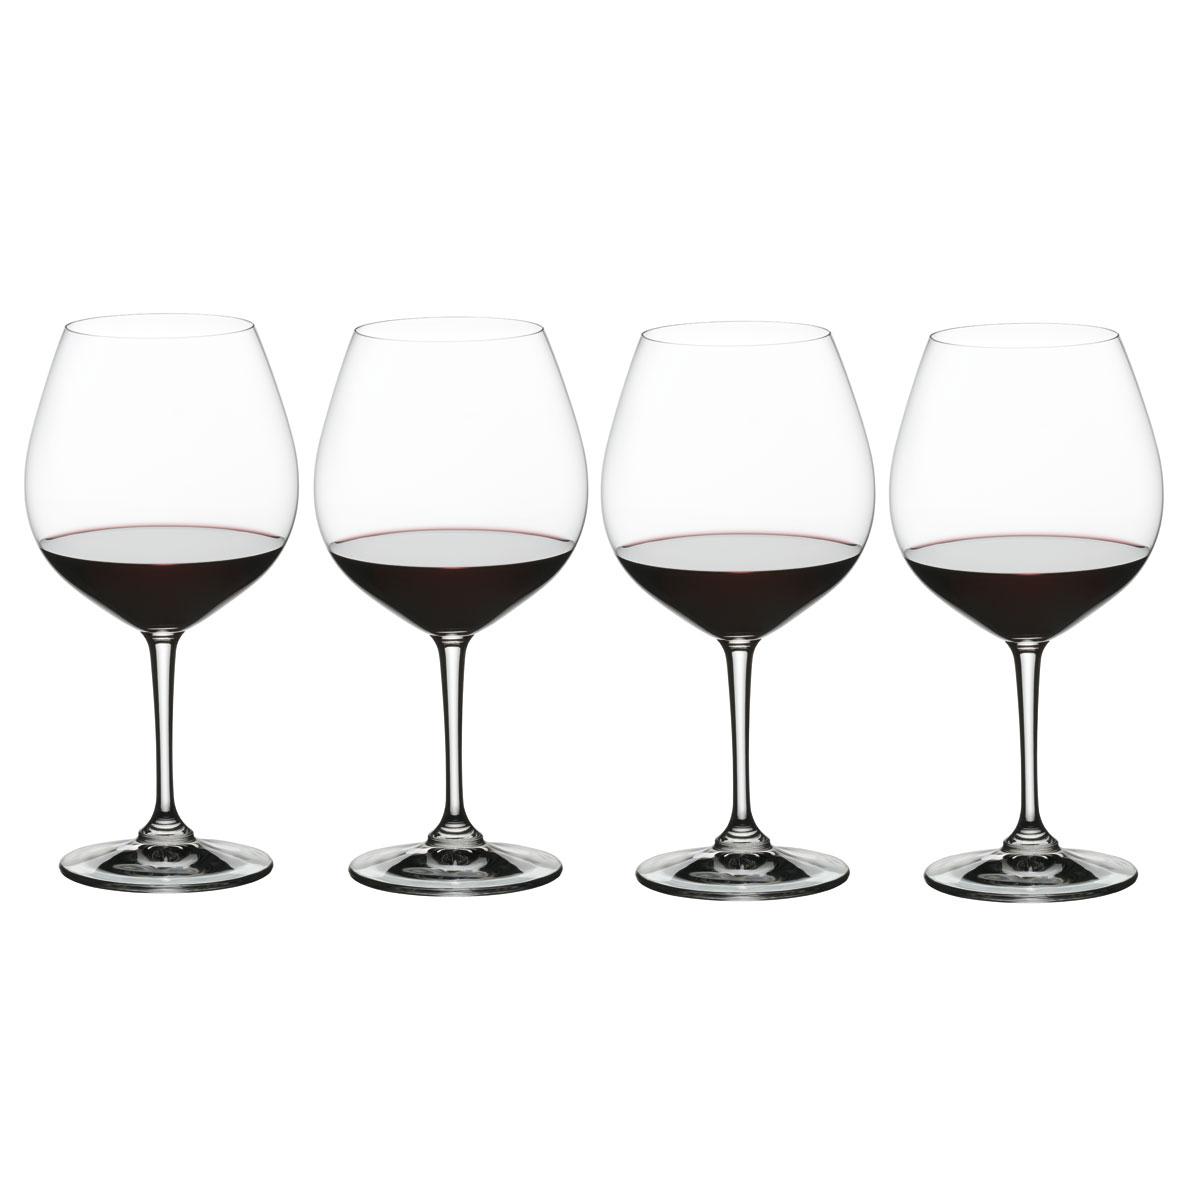 Nachtmann Vivino Burgundy Glasses, Set of 4